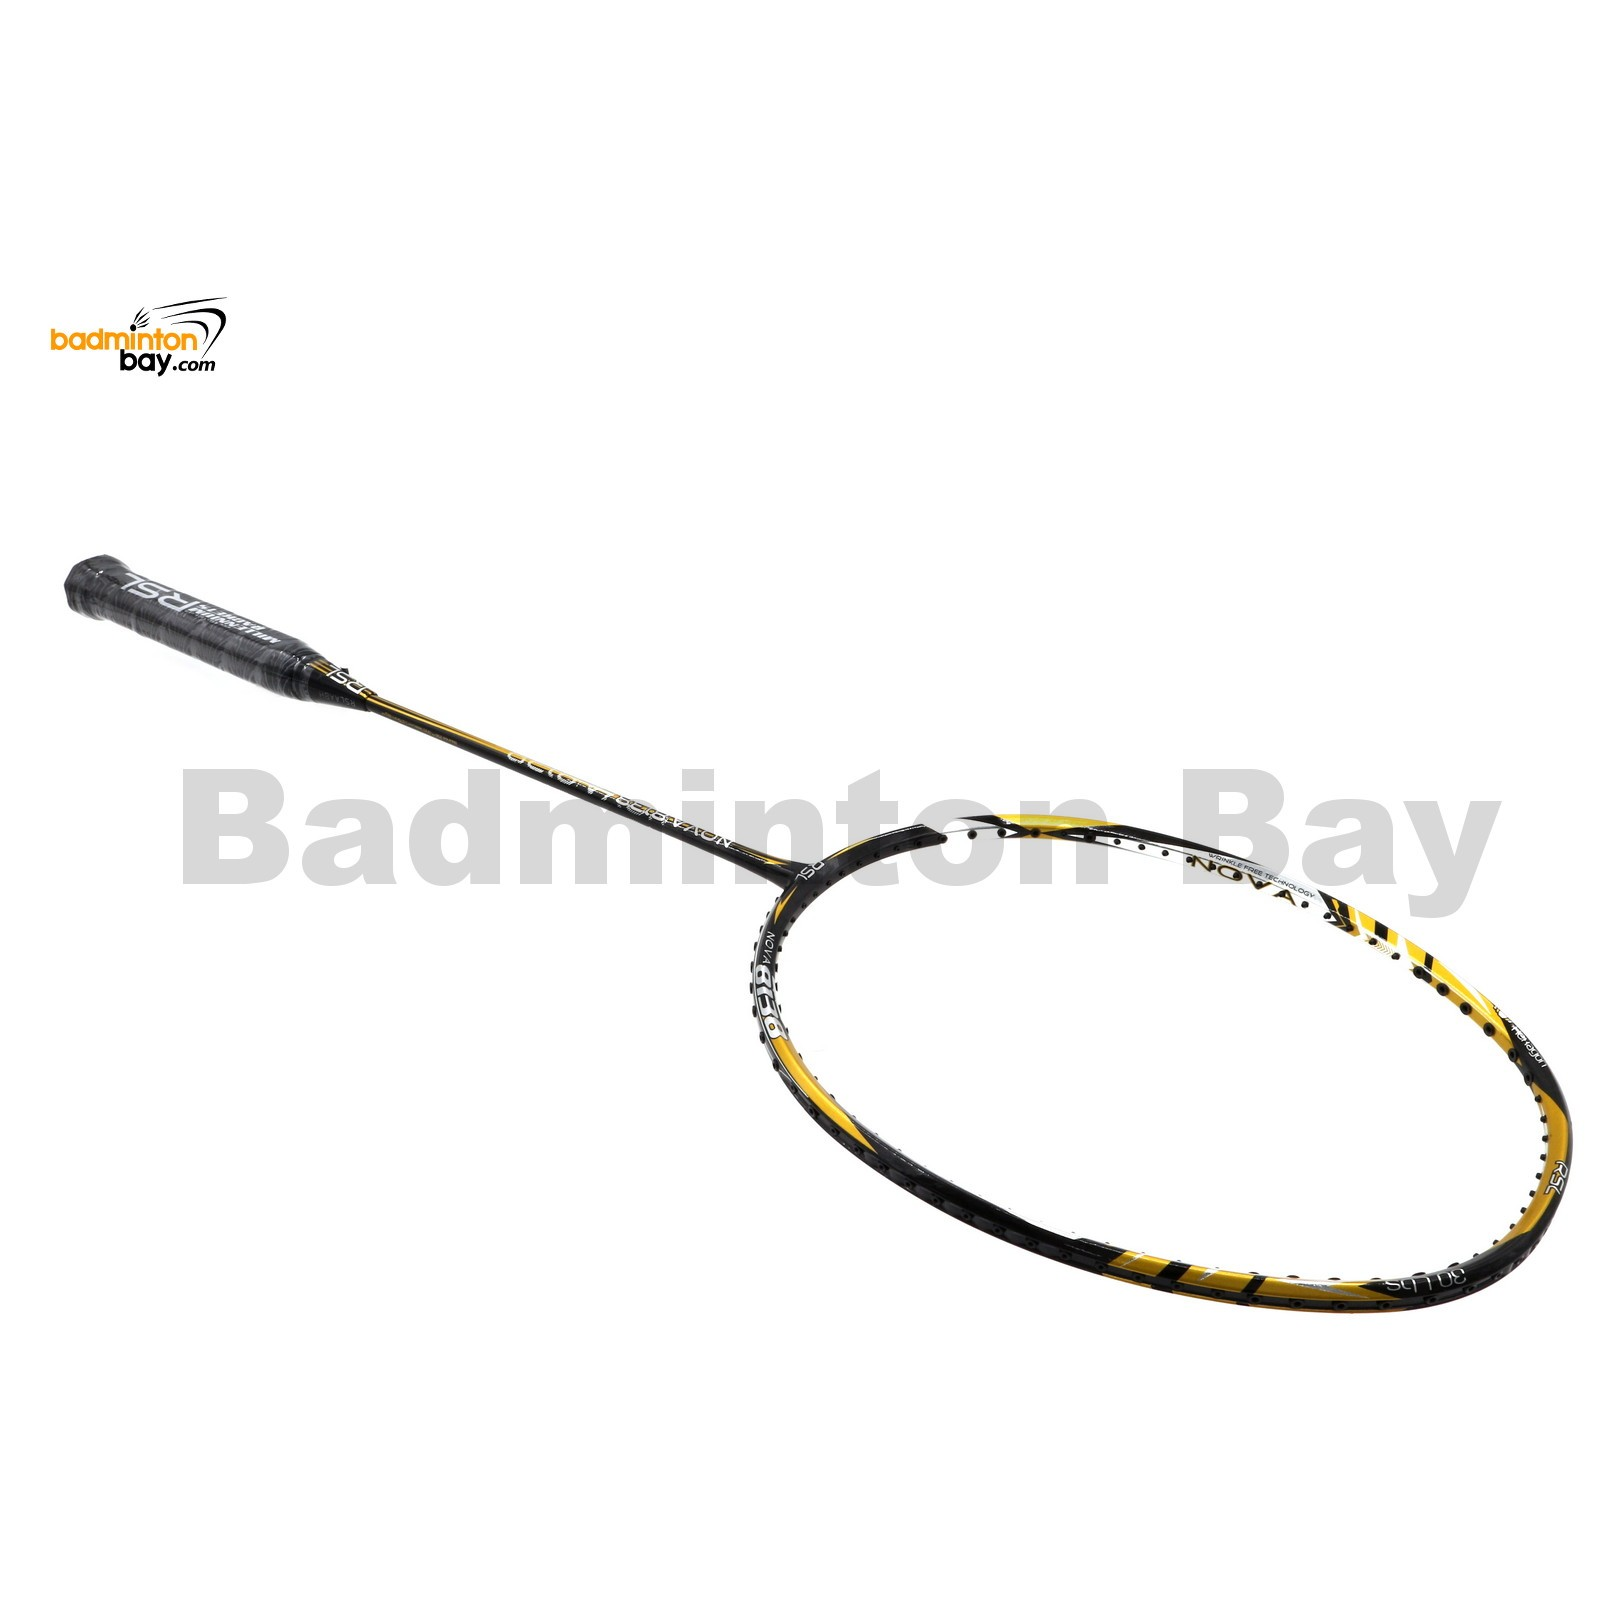 Rsl Nova Black Gold Badminton Racket 5u G5